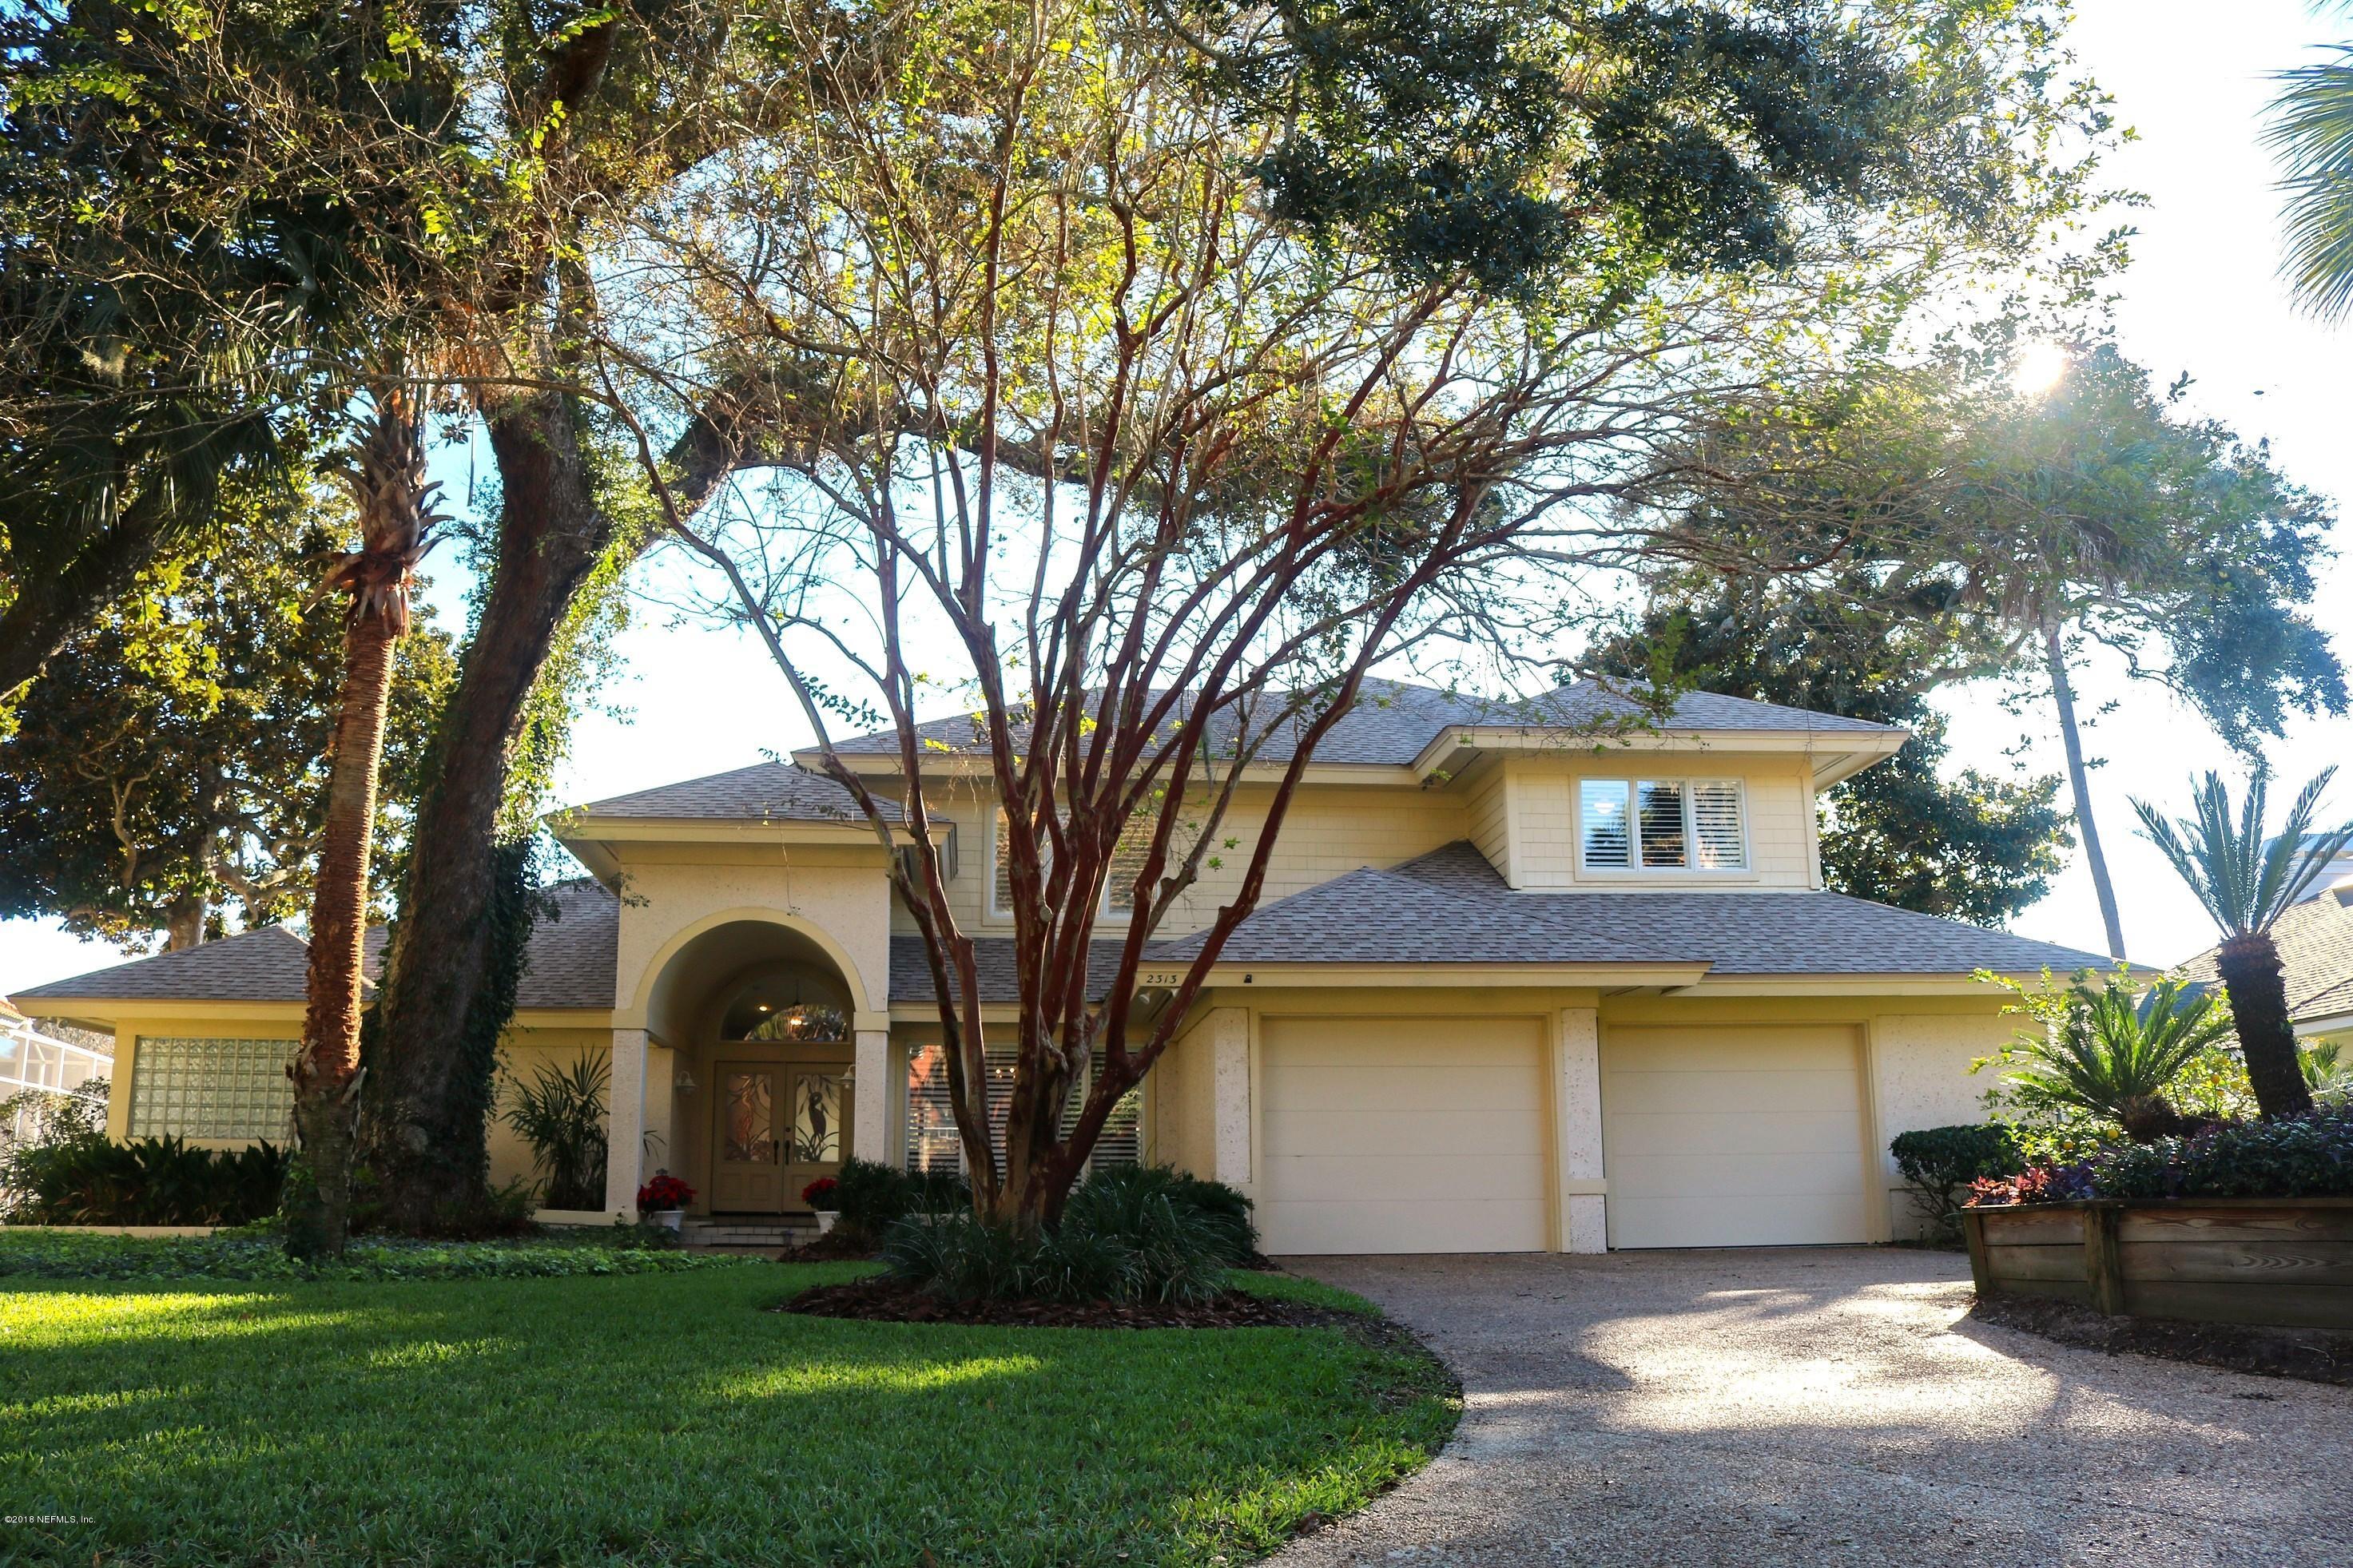 2313 BEACHCOMBER, ATLANTIC BEACH, FLORIDA 32233, 5 Bedrooms Bedrooms, ,4 BathroomsBathrooms,Residential - single family,For sale,BEACHCOMBER,968539